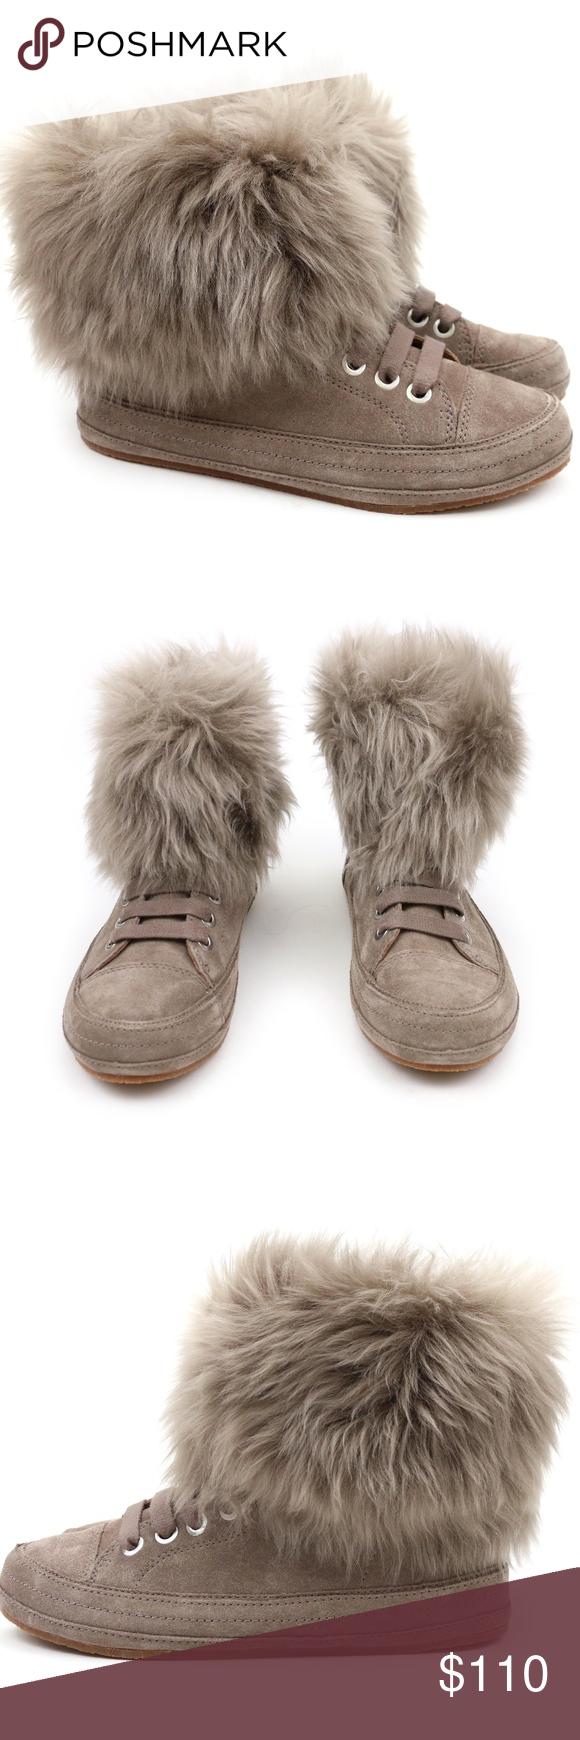 ce23dae05bc UGG Australia Antoine Fur Slate Sheepskin Sneakers This fresh and ...